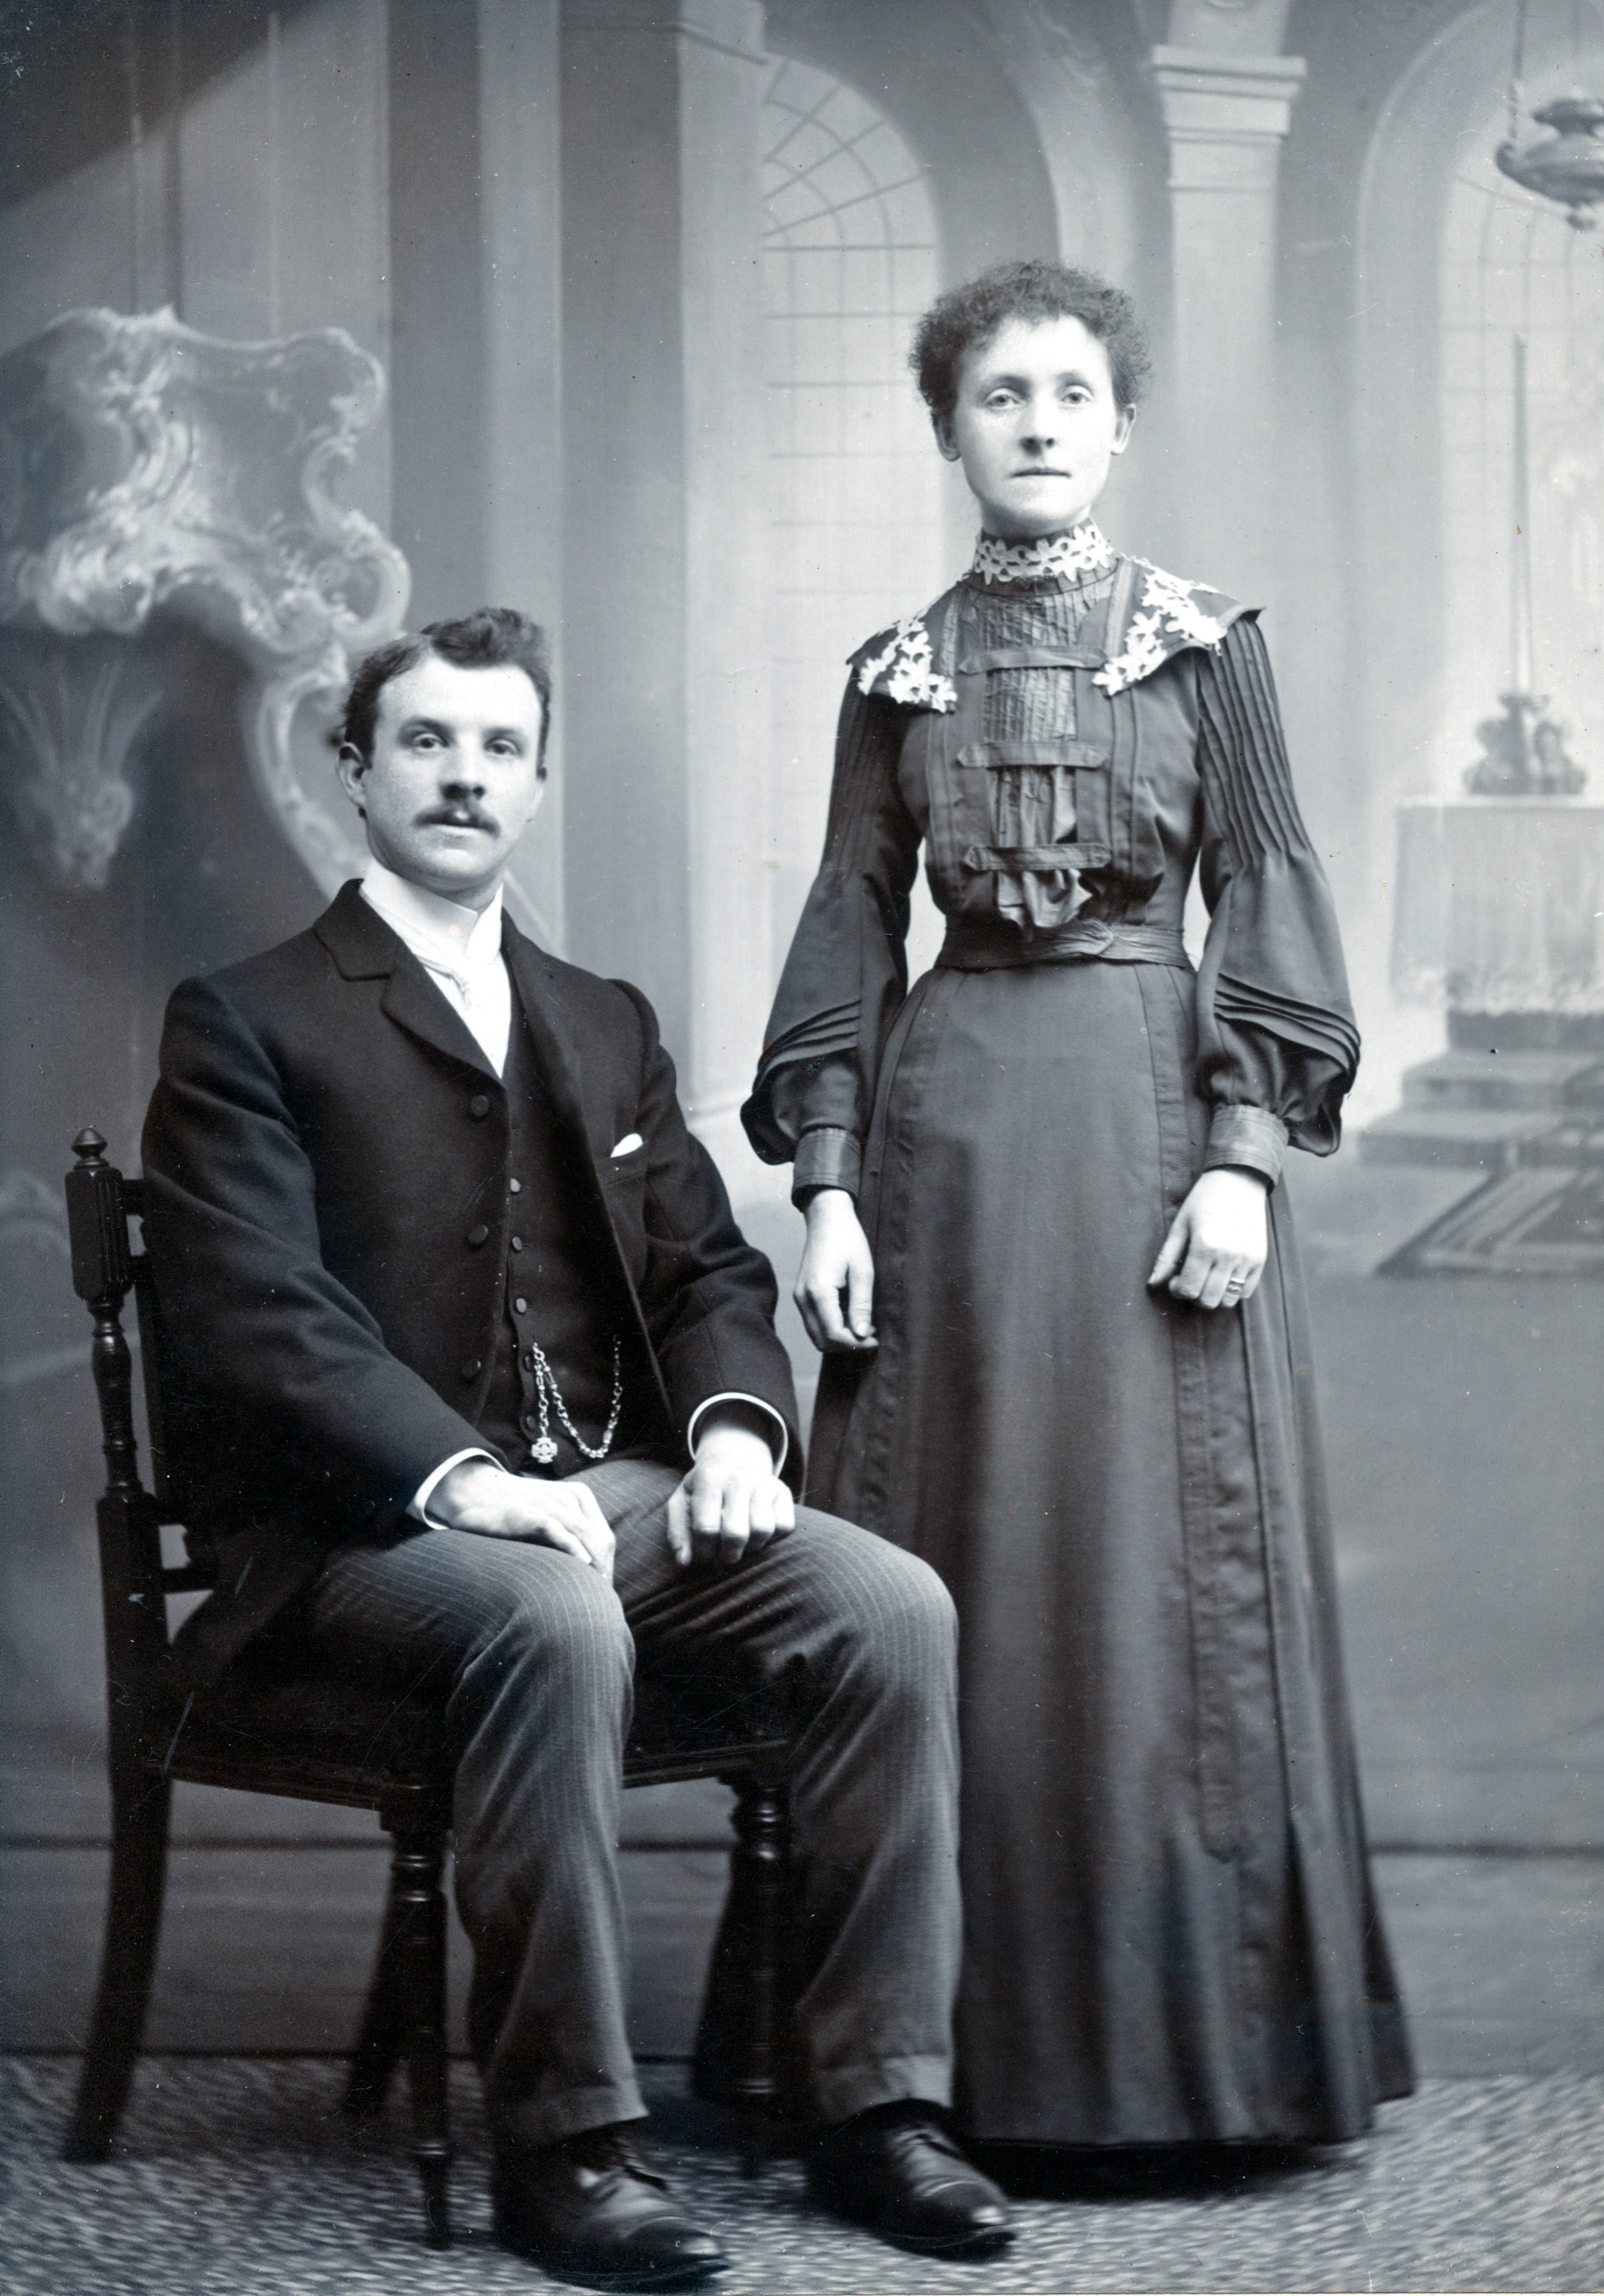 Martha & Wil Tindell